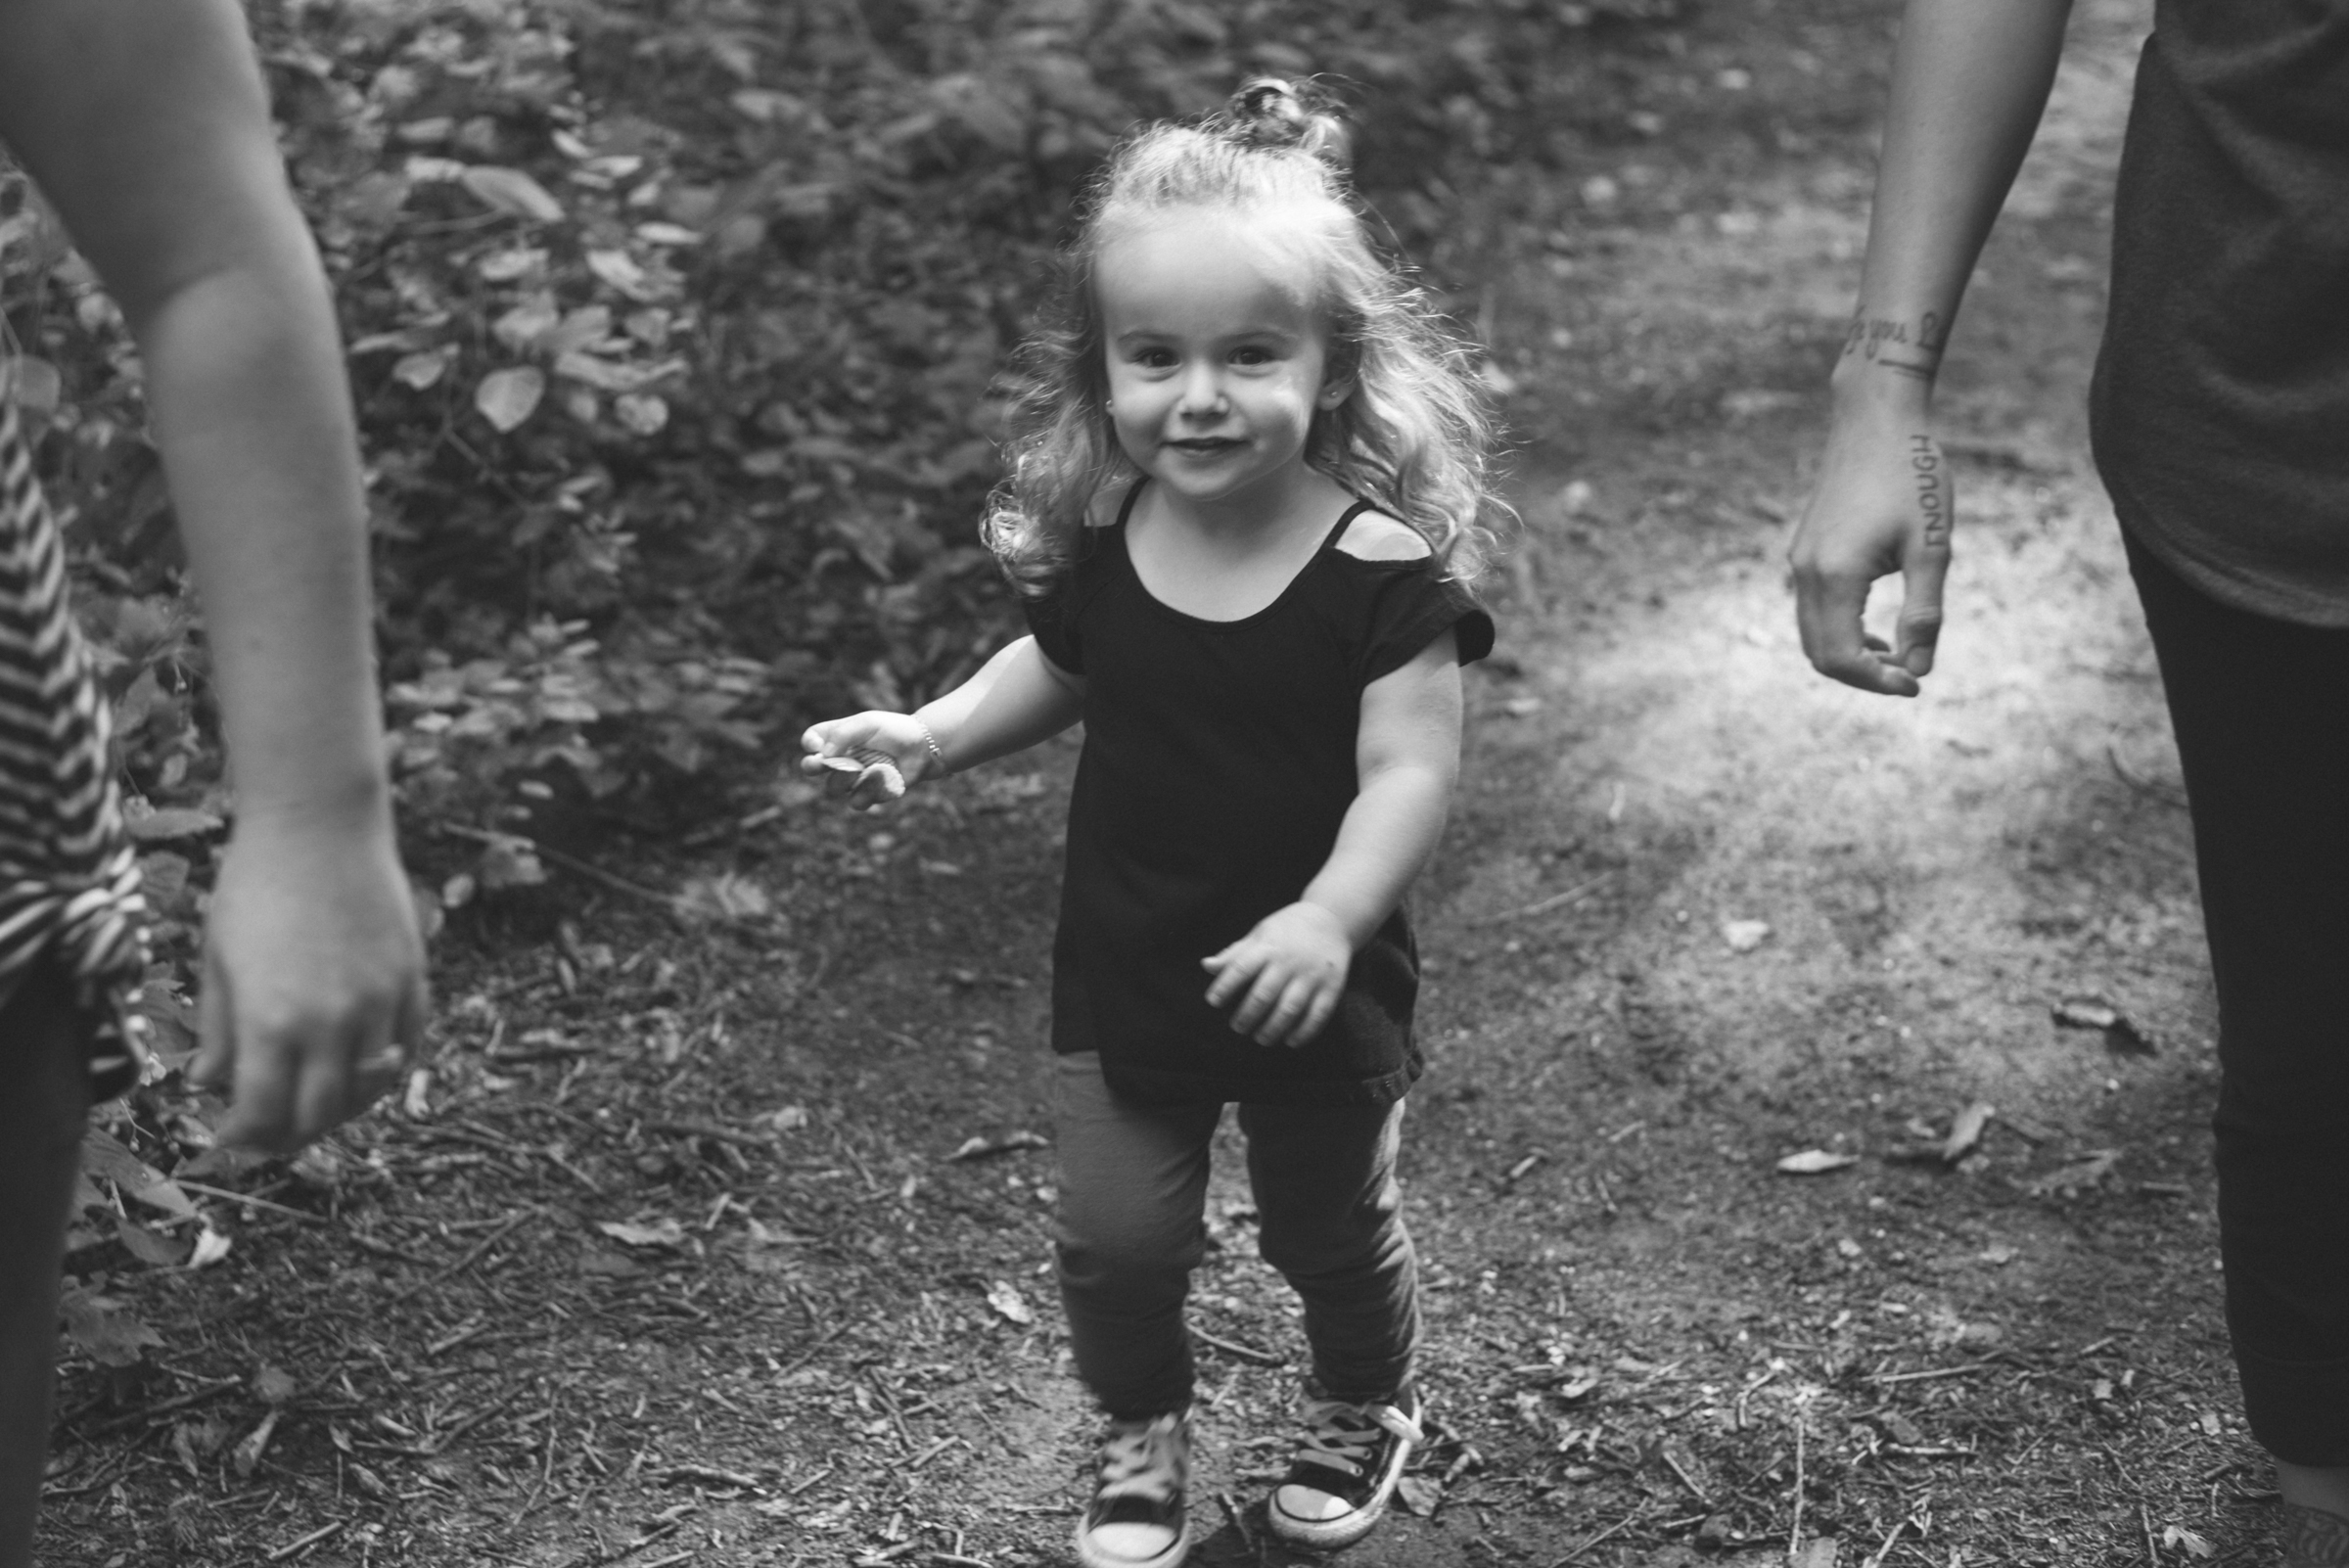 Family Lifestyle, Aylmer, London, St. Thomas, TIllsonburg Ontario. Kyle Green Photography